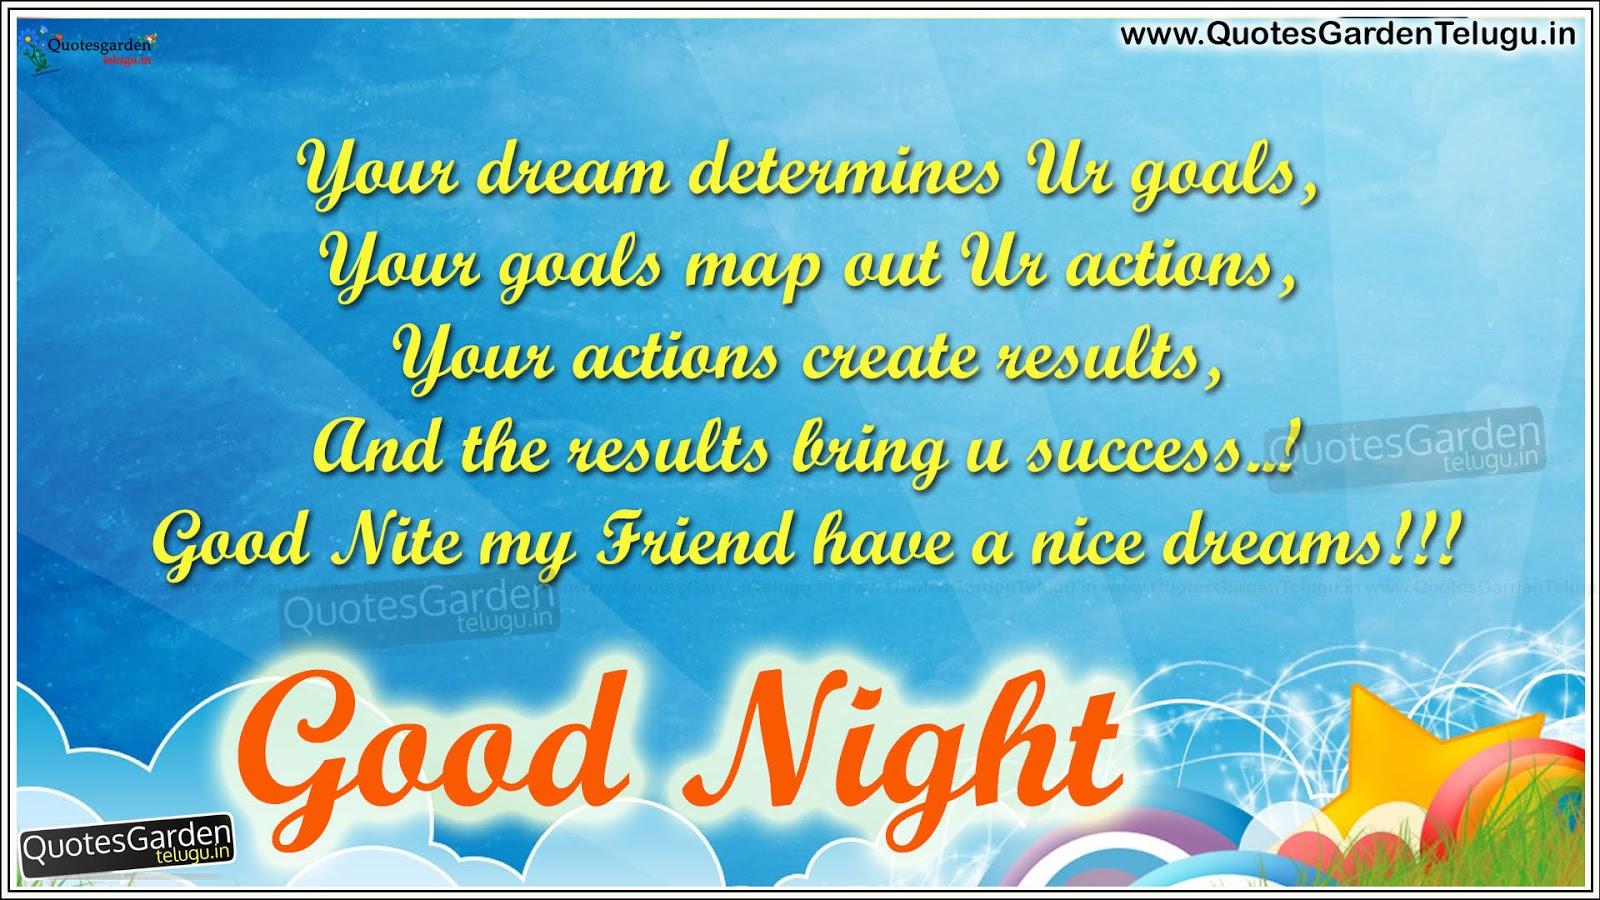 Best Good Night Status Messages For Friends Quotes Garden Telugu